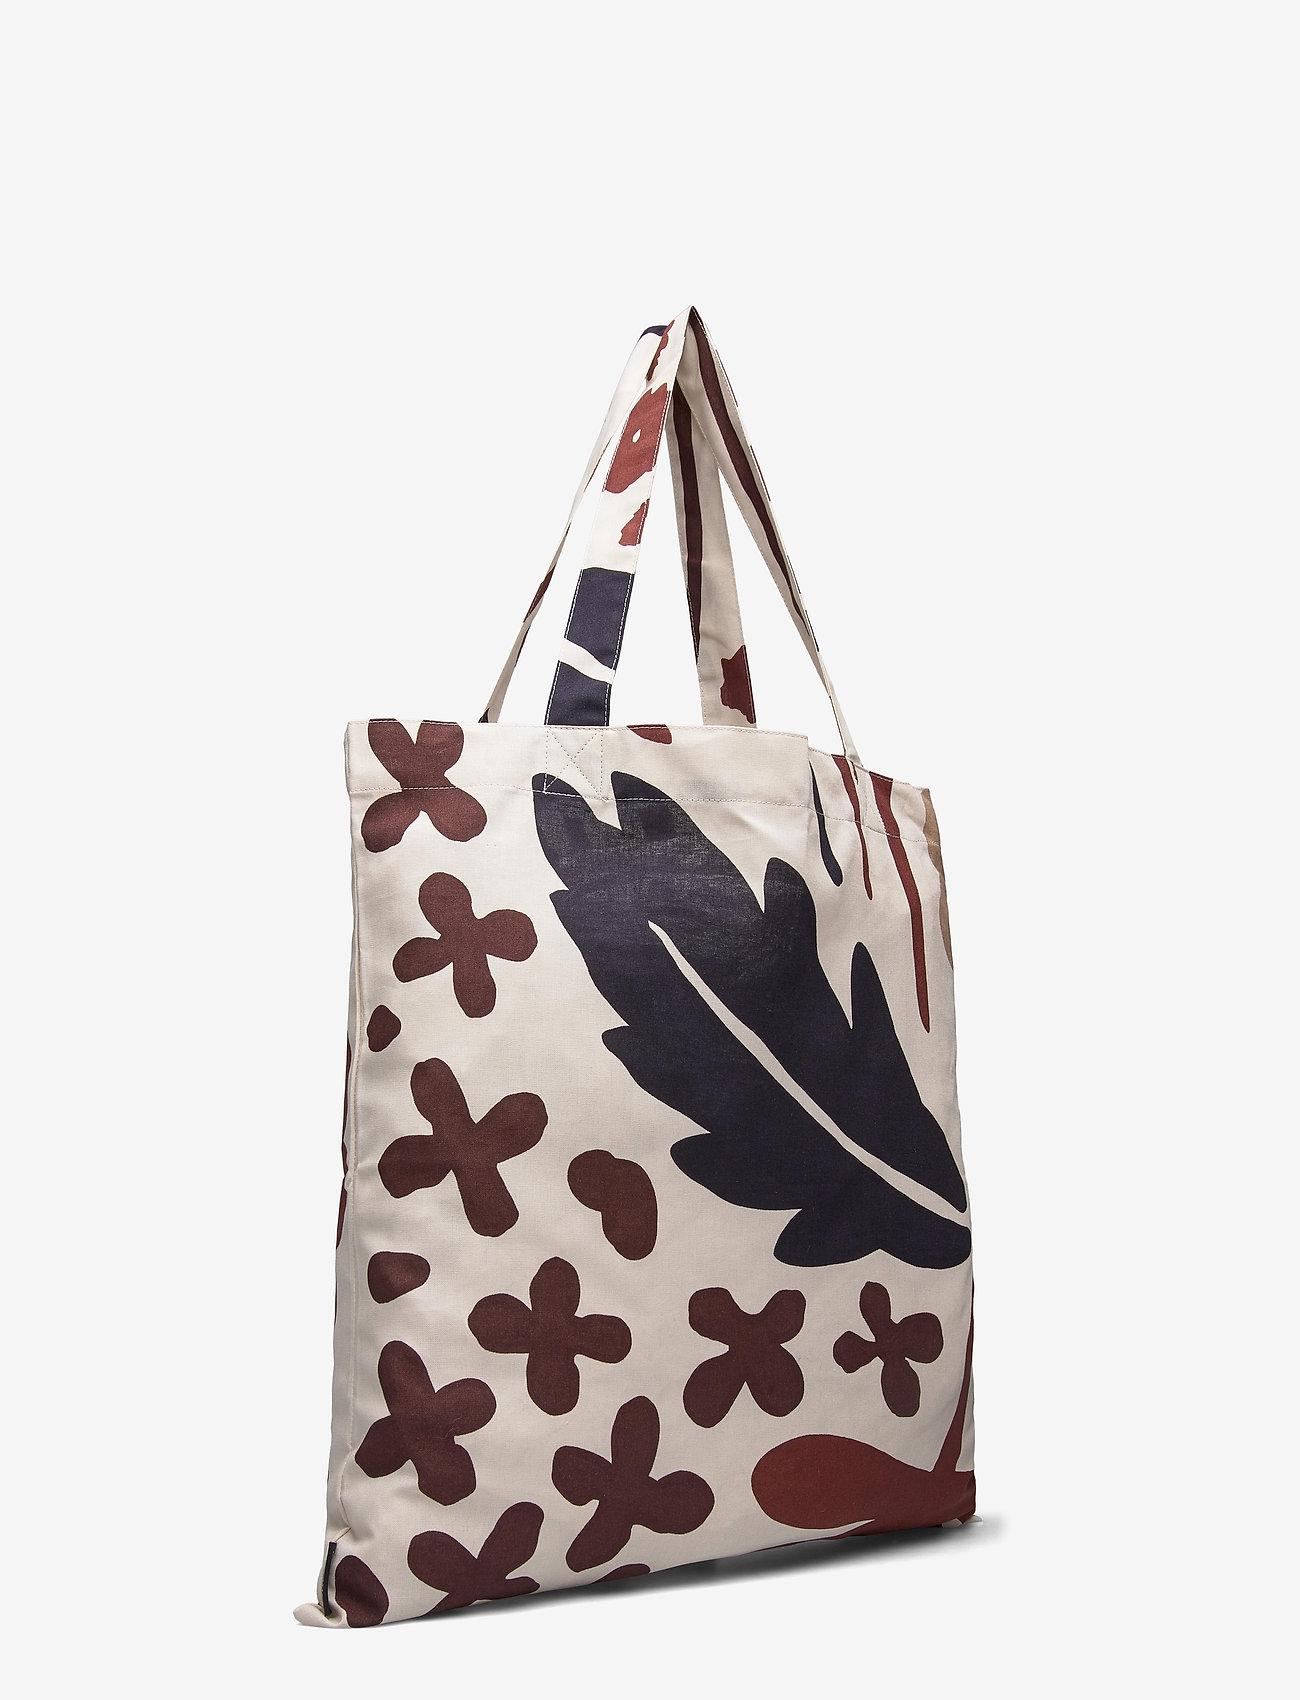 Suvi Bag (Beige Brown) (31 €) - Marimekko Home ruqol